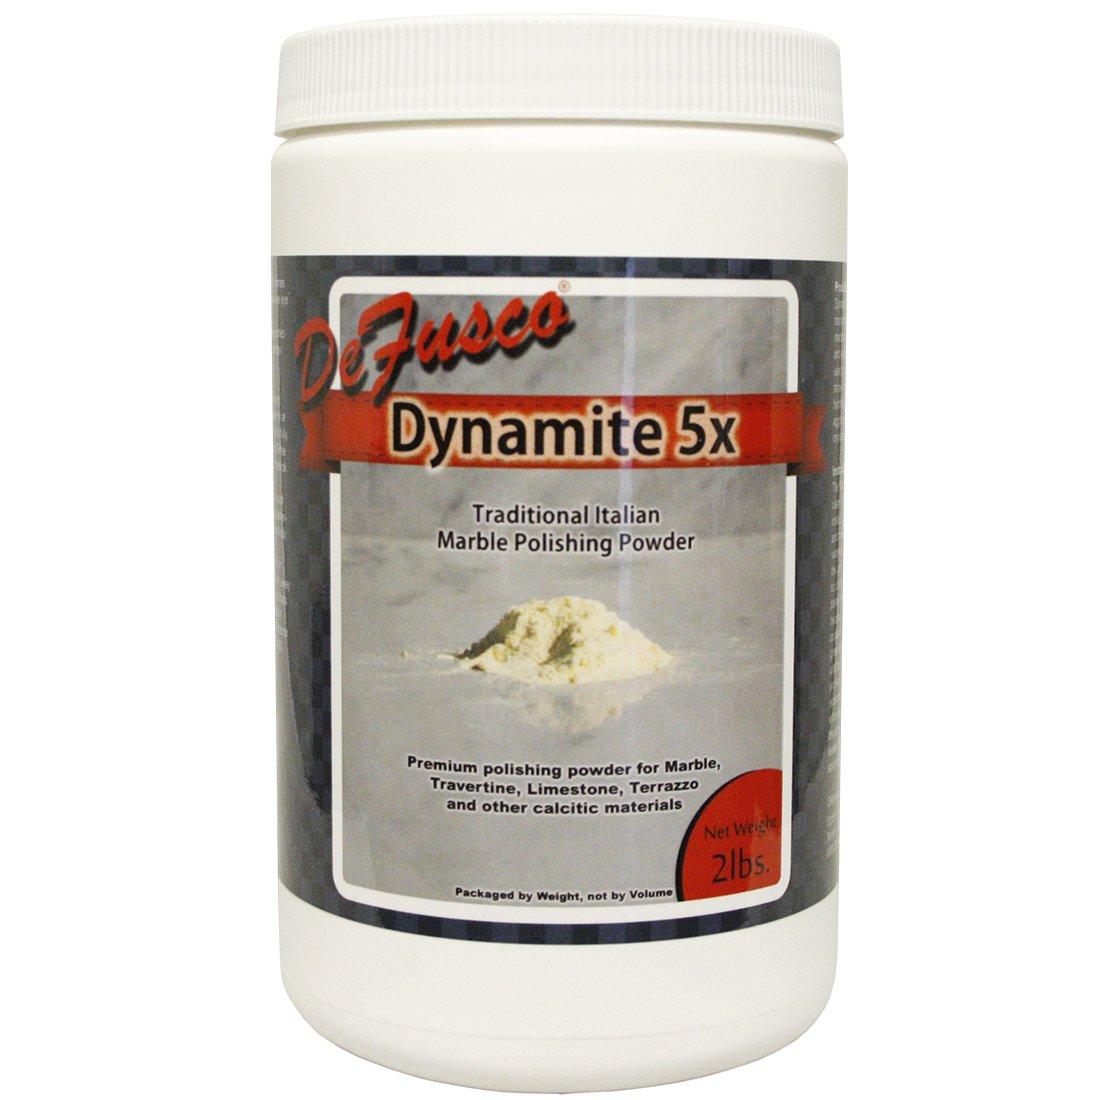 Dynamite 5x Traditional Italian Marble Polishing Powder - 2lbs